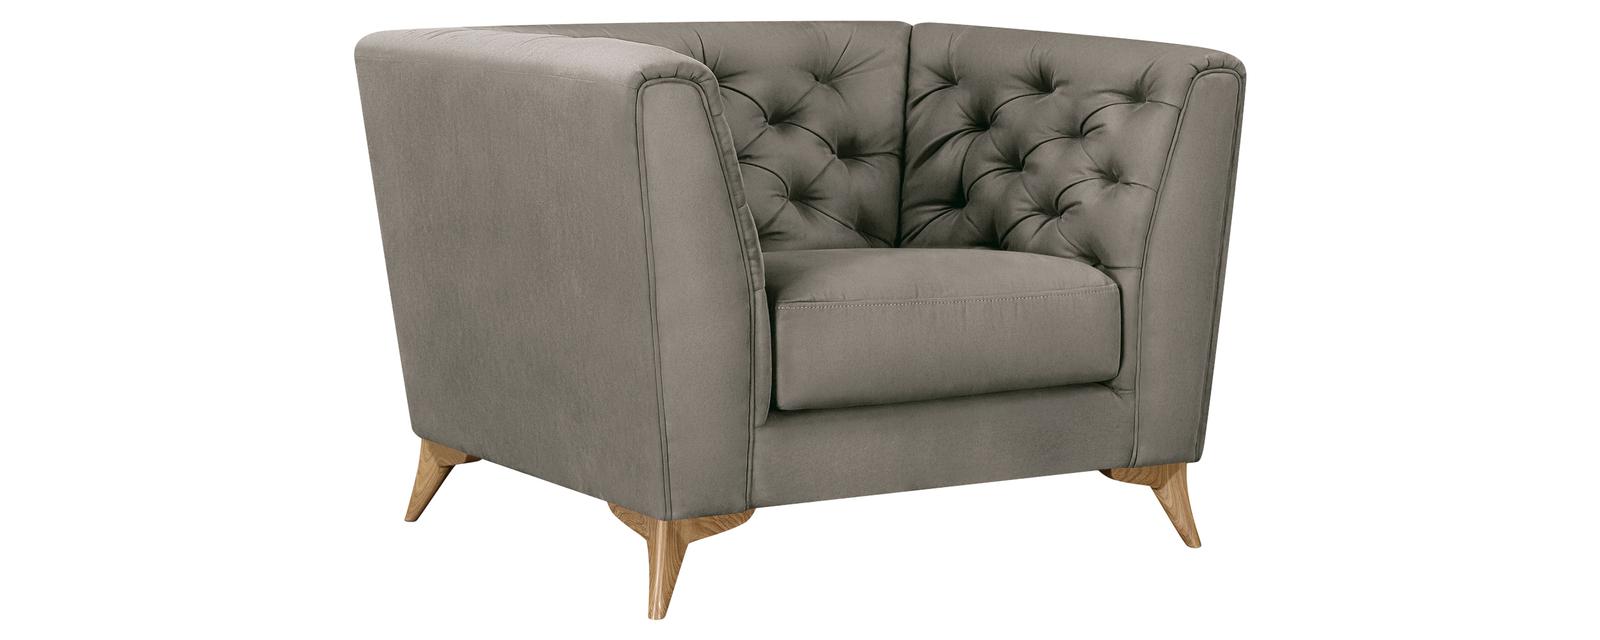 Кресло тканевое Честер Fulton серый (Искусственная замша)